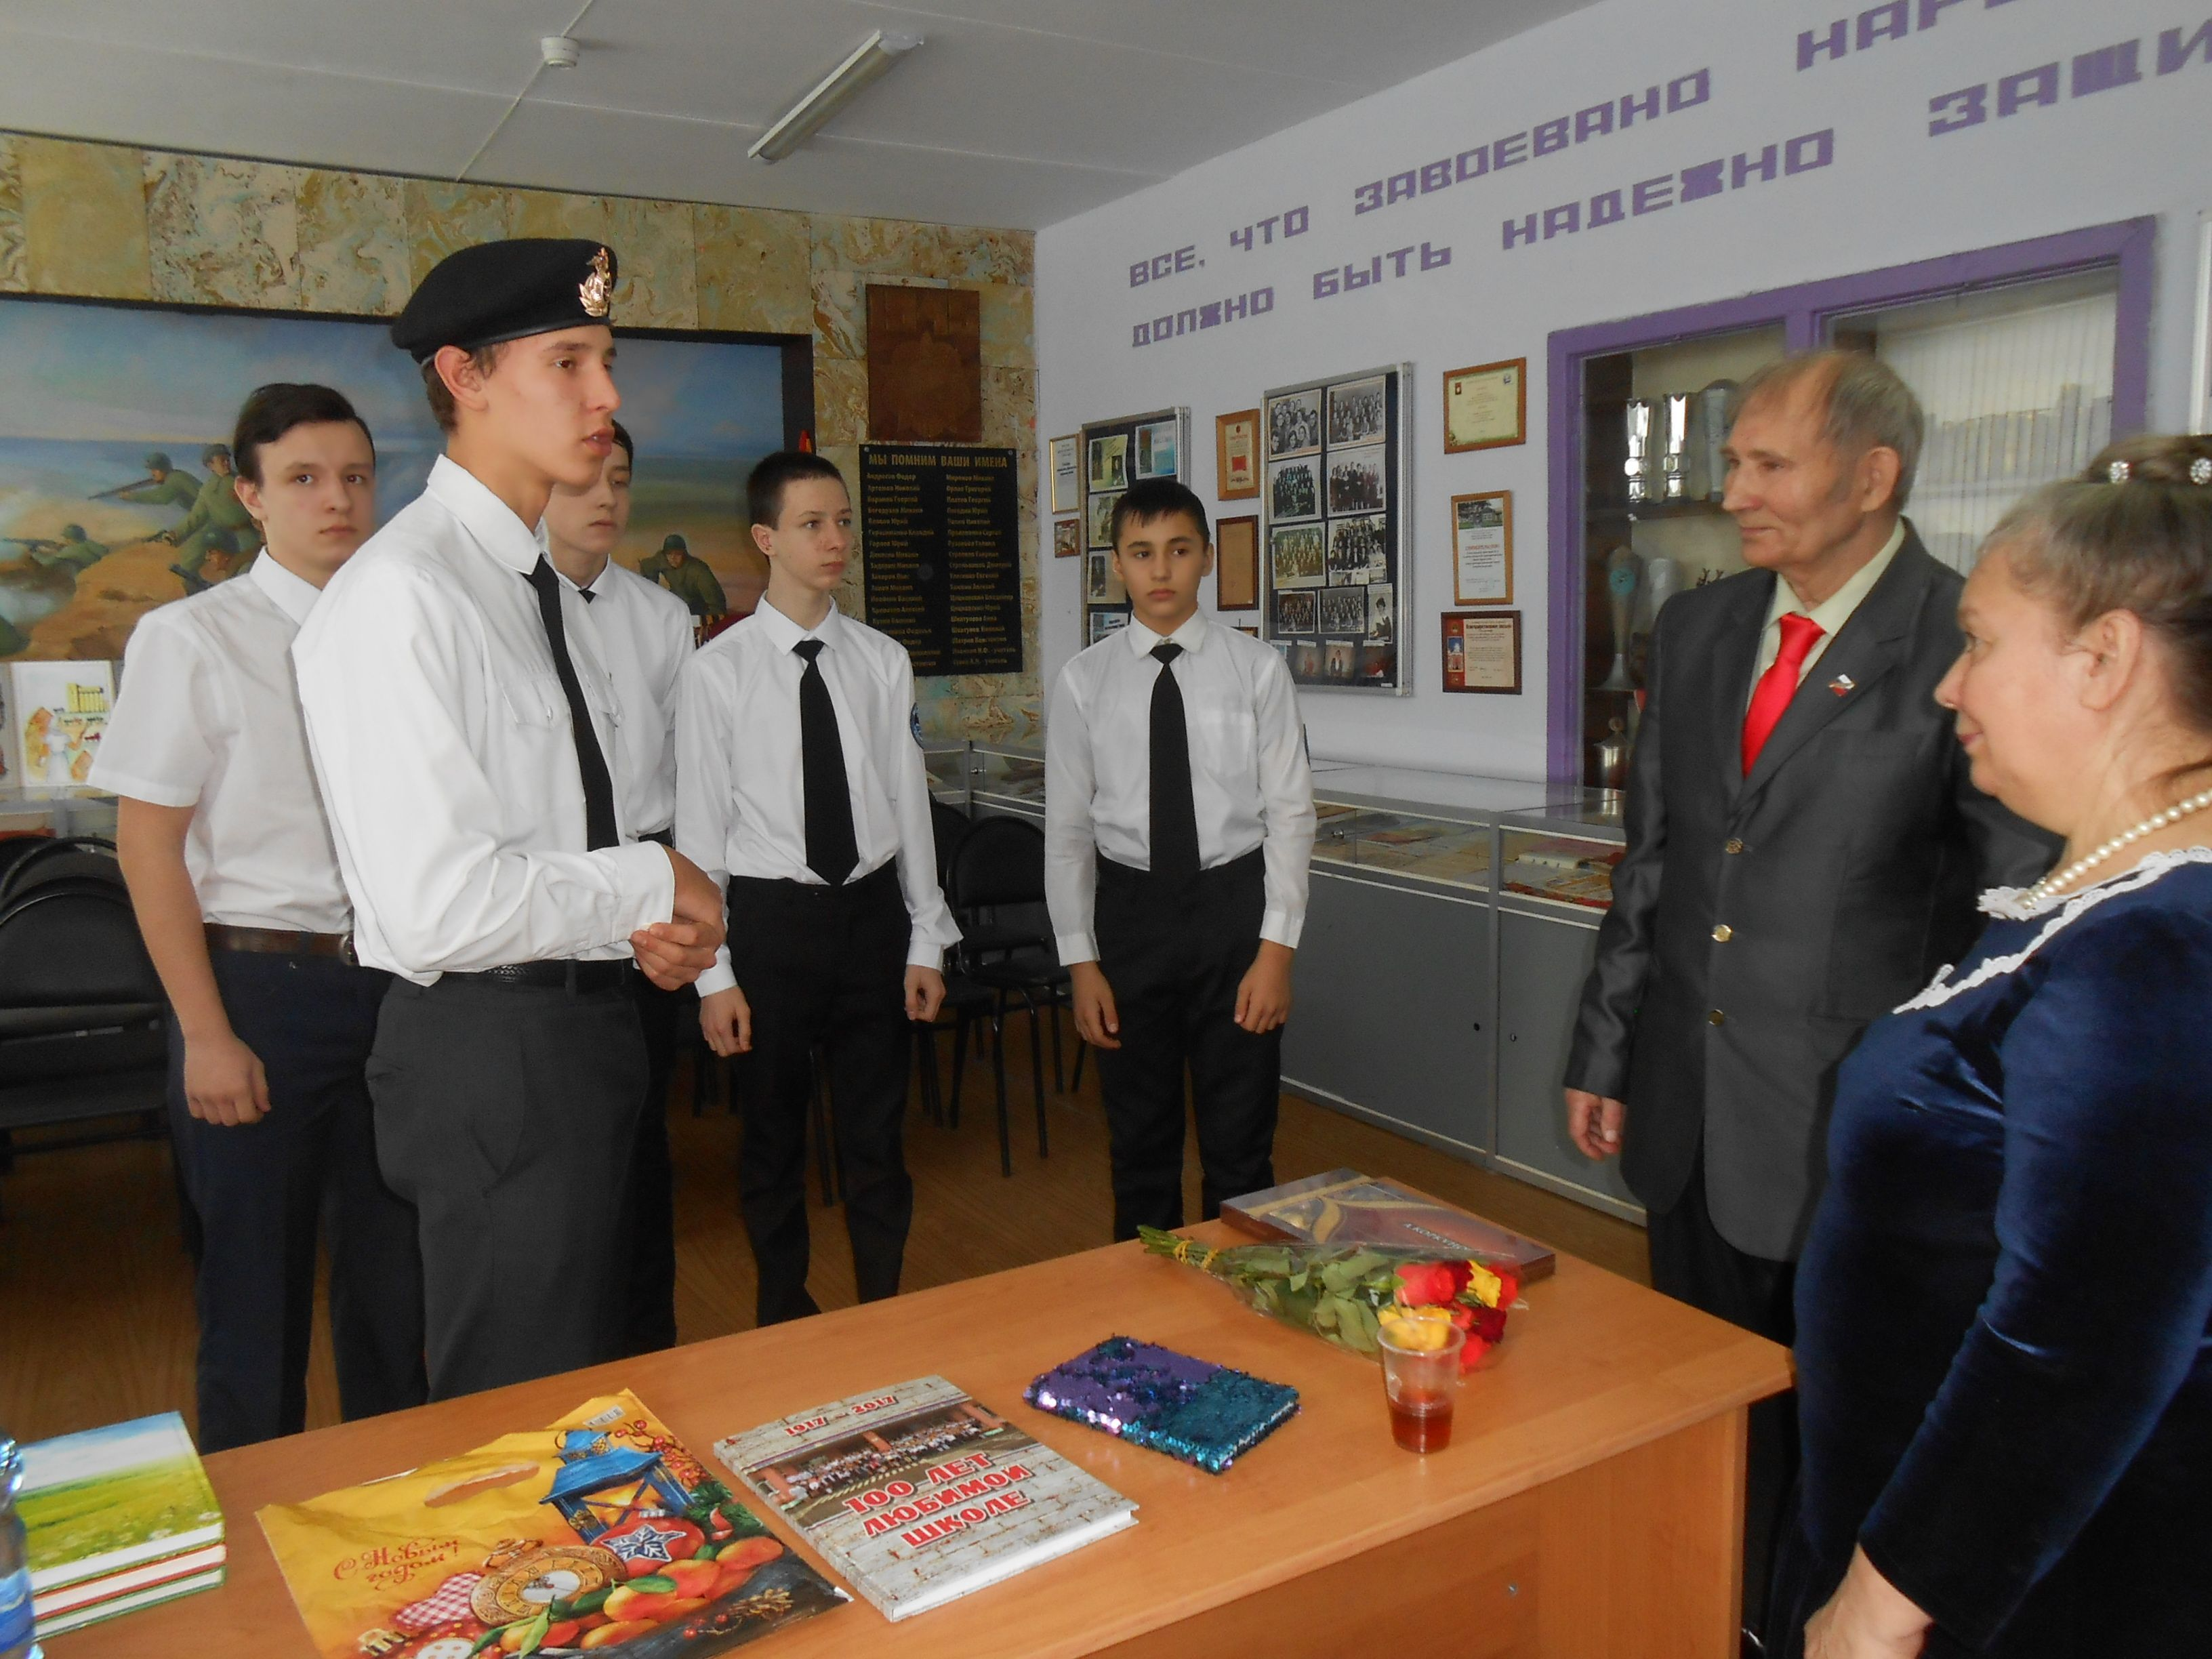 Командир юнармейского отряда Феофилов С.